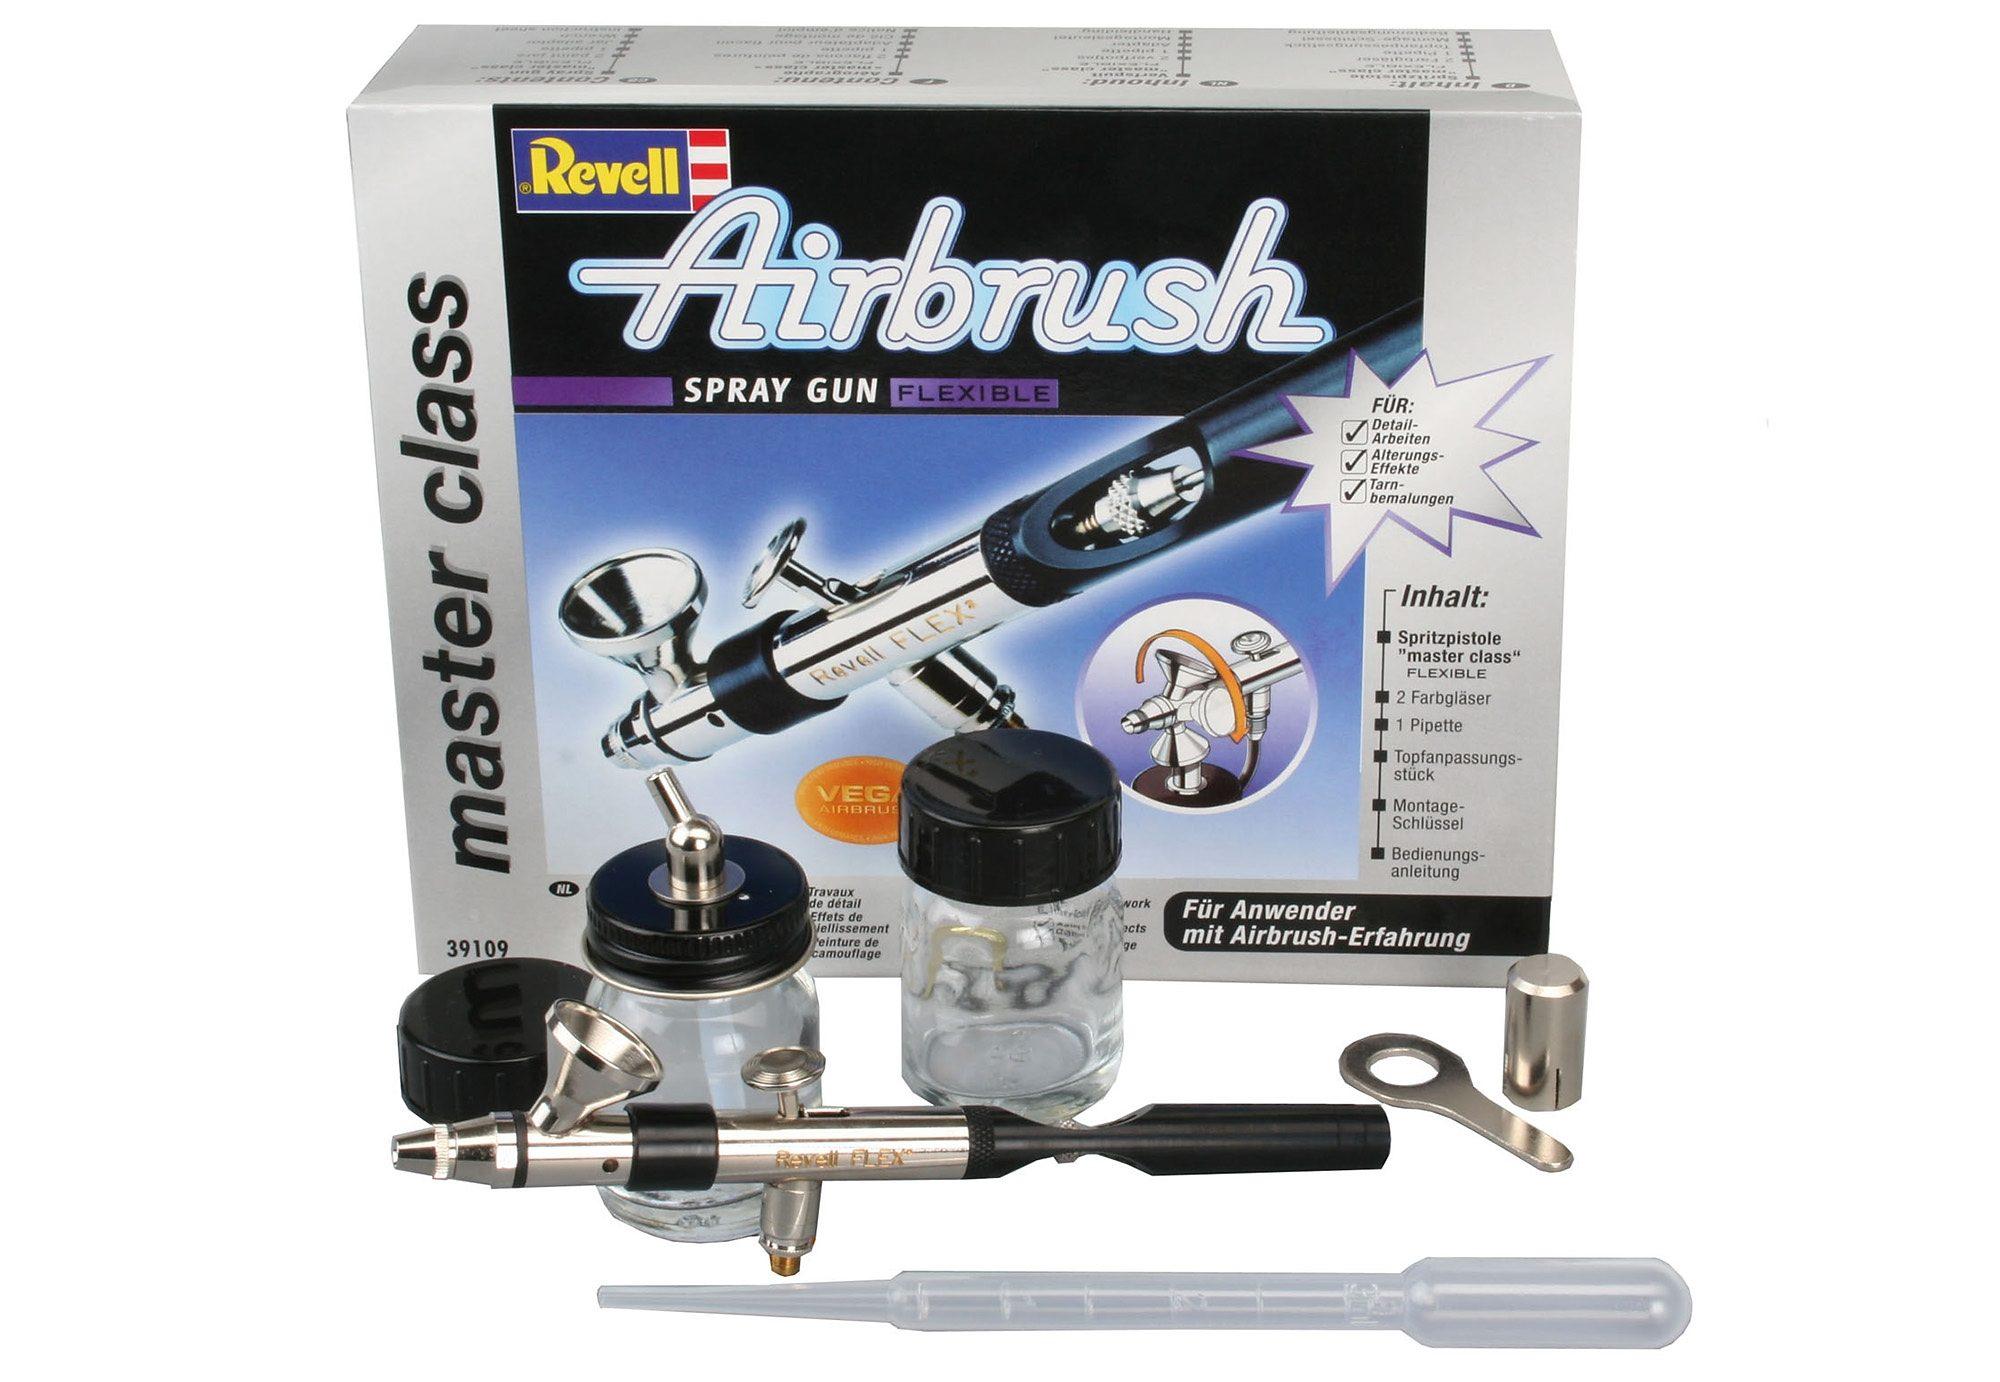 Revell® Airbrush-Pistole,  Spray gun master class Flexible  Preisvergleich